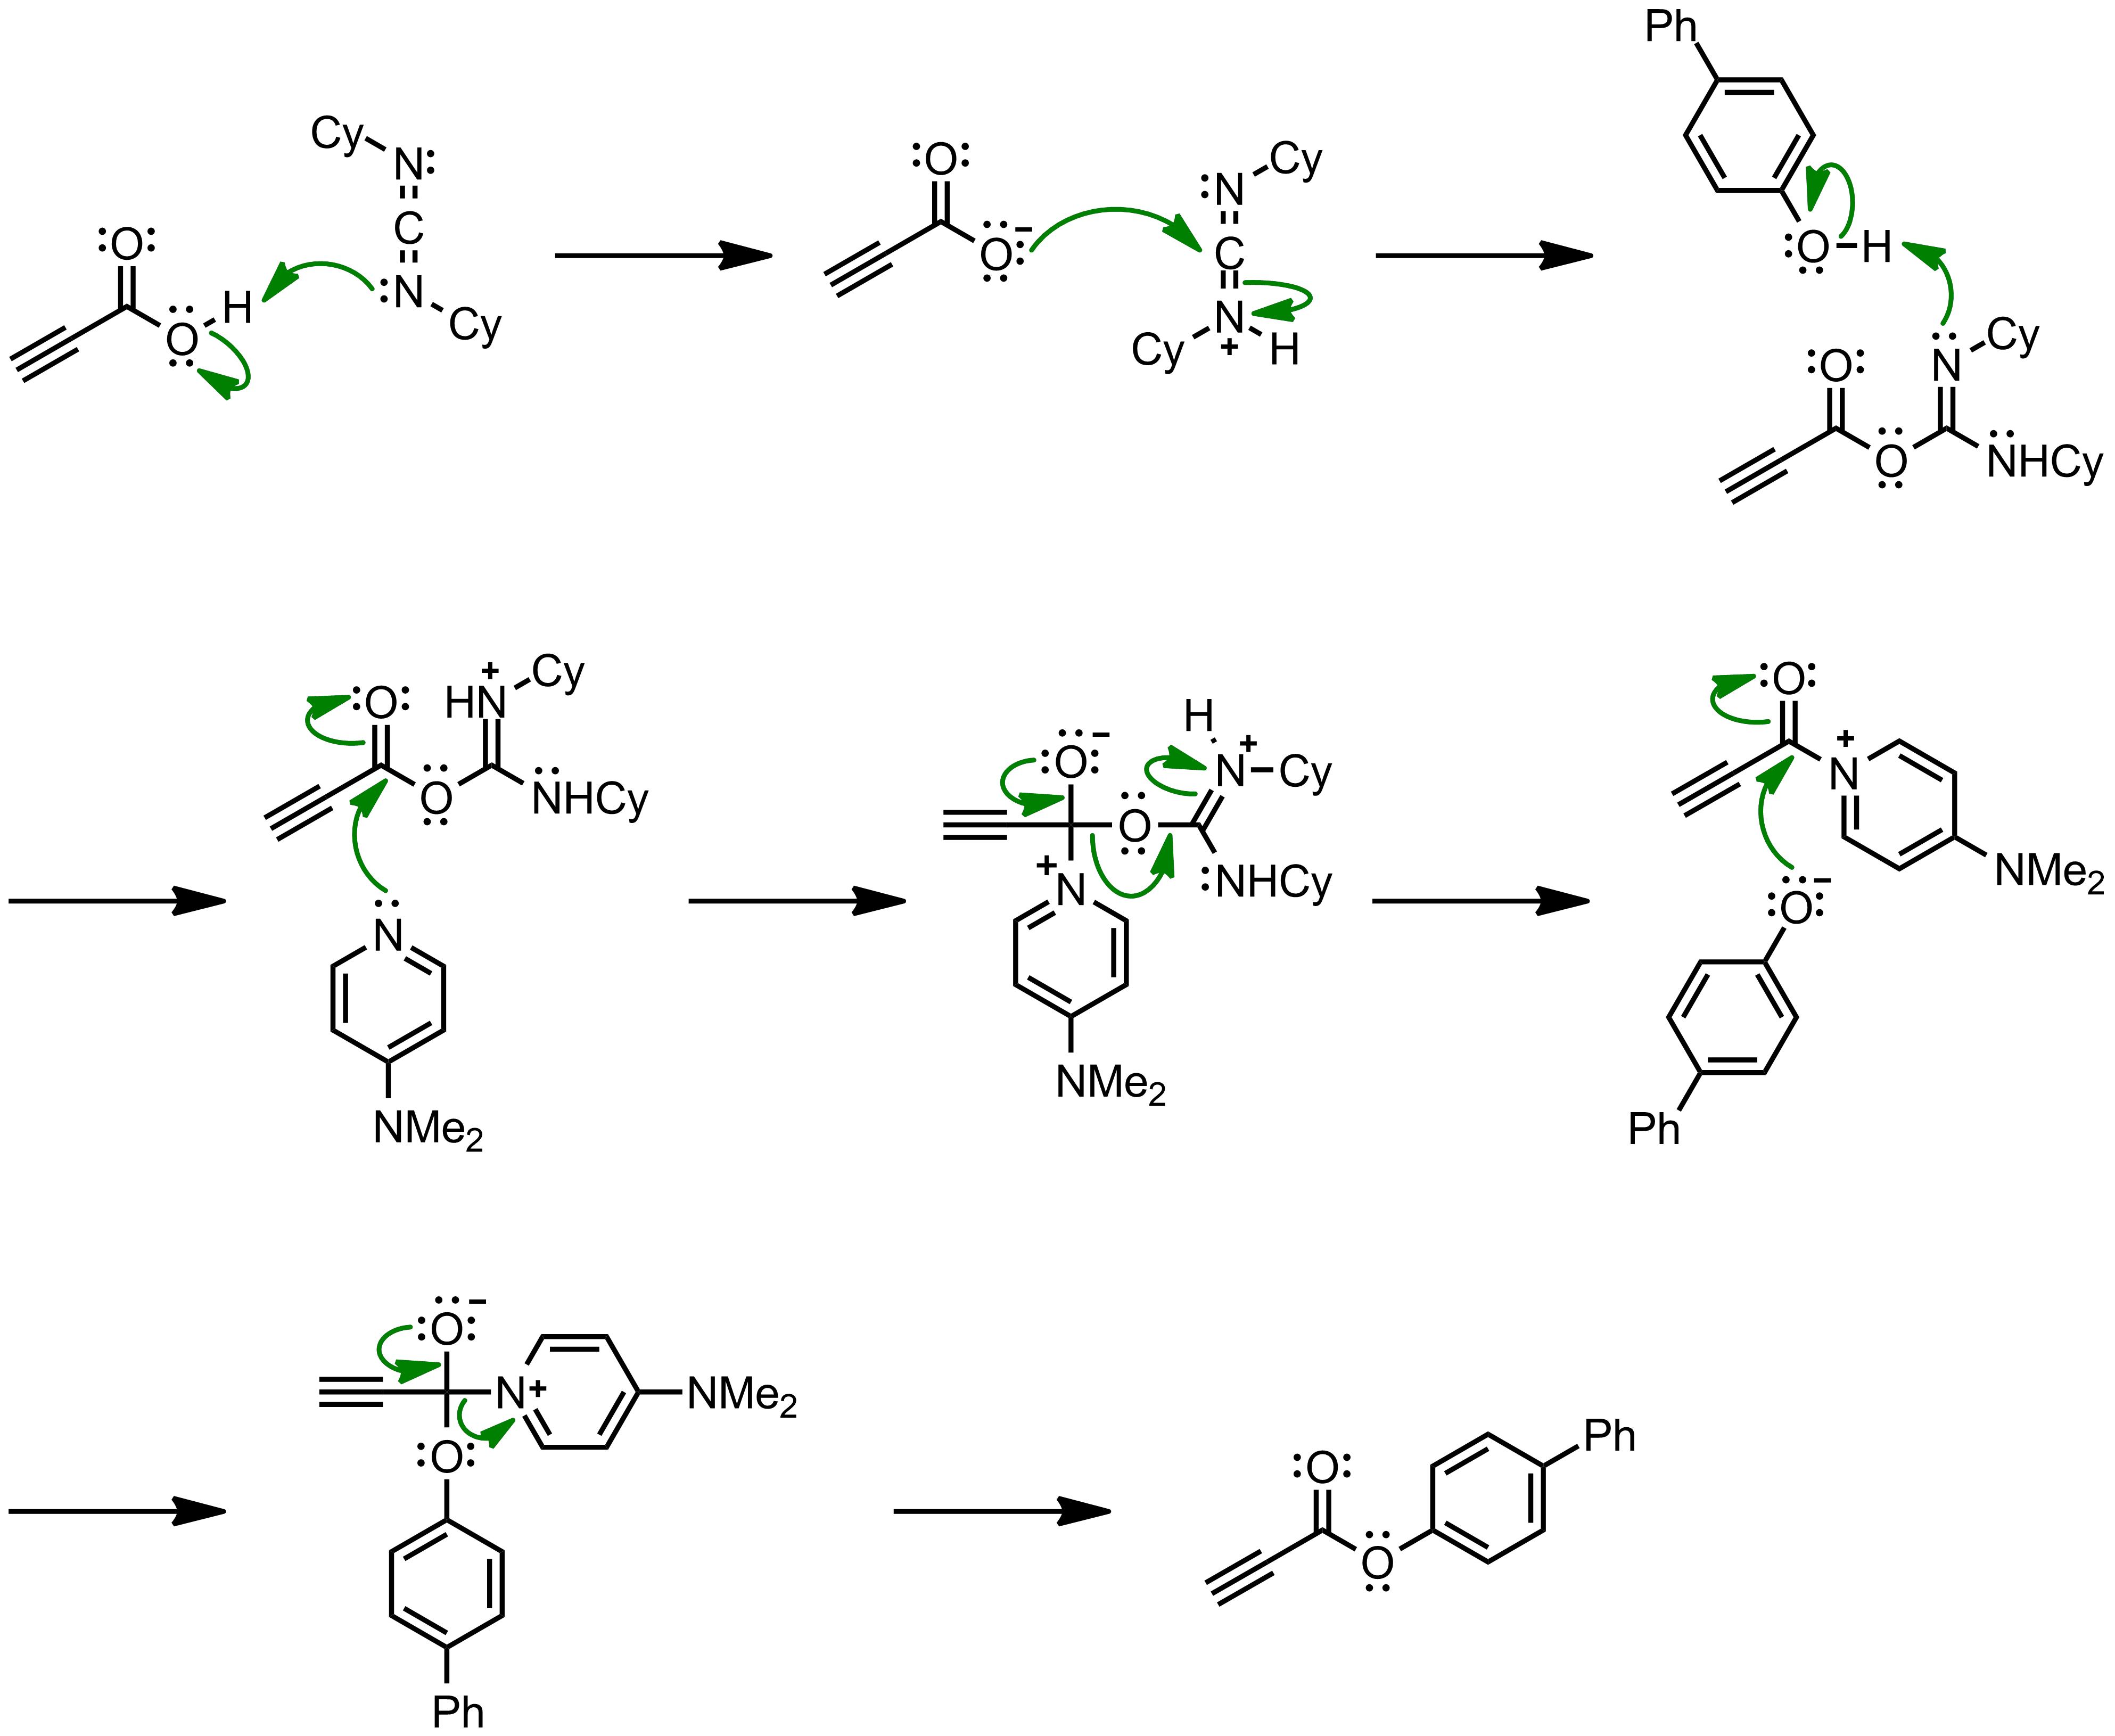 Mechanism of the Steglich Esterification